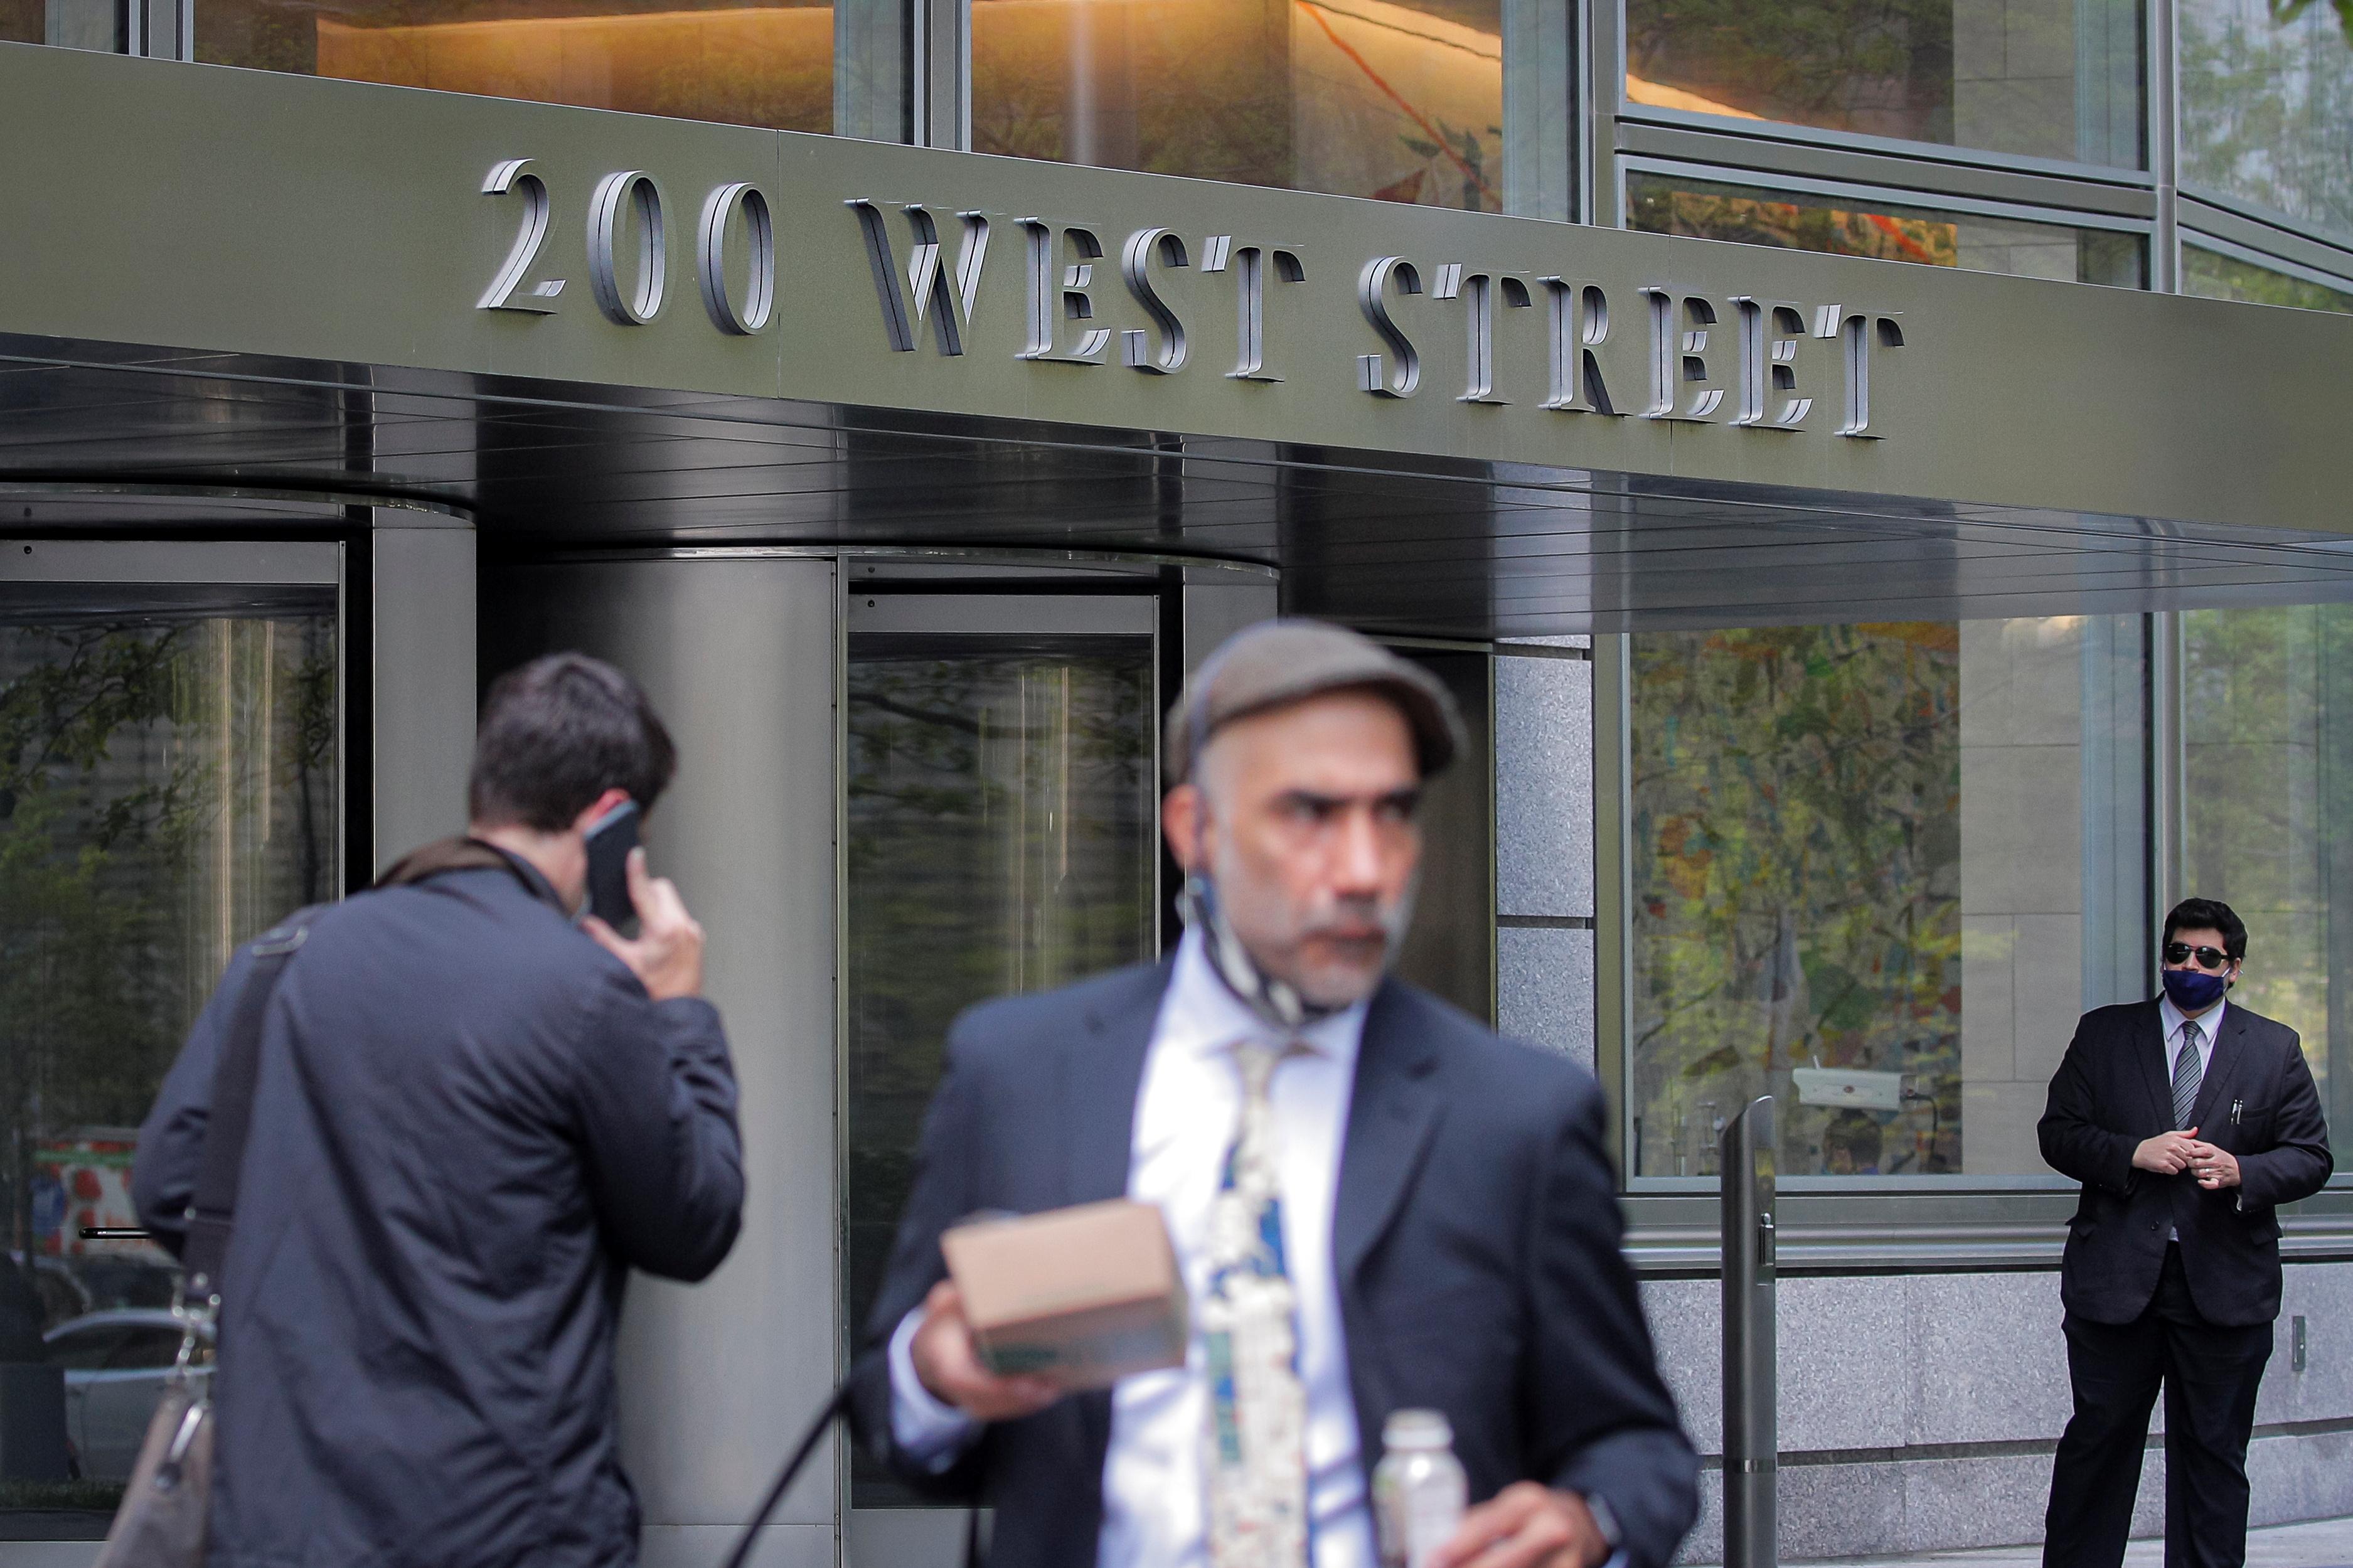 Workers walk outside 200 West Street, the Goldman Sachs headquarters, in New York City, U.S., May 4, 2021.  REUTERS/Brendan McDermid